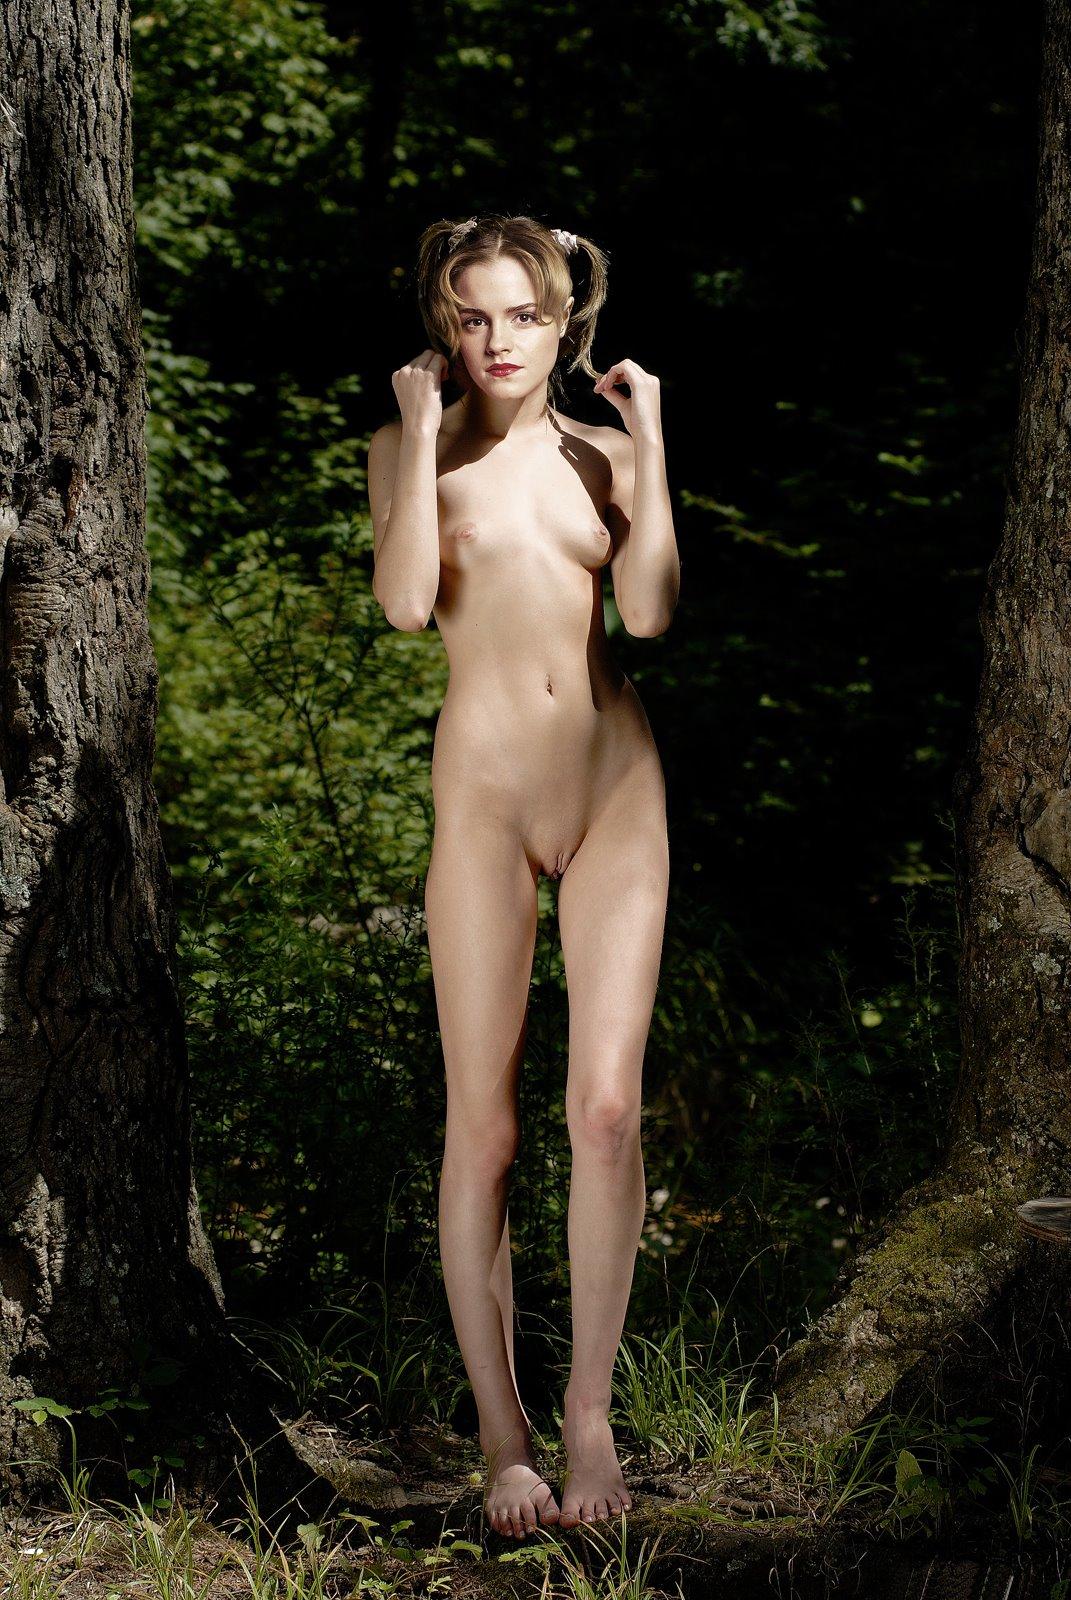 Фото of girls nude 15 фотография